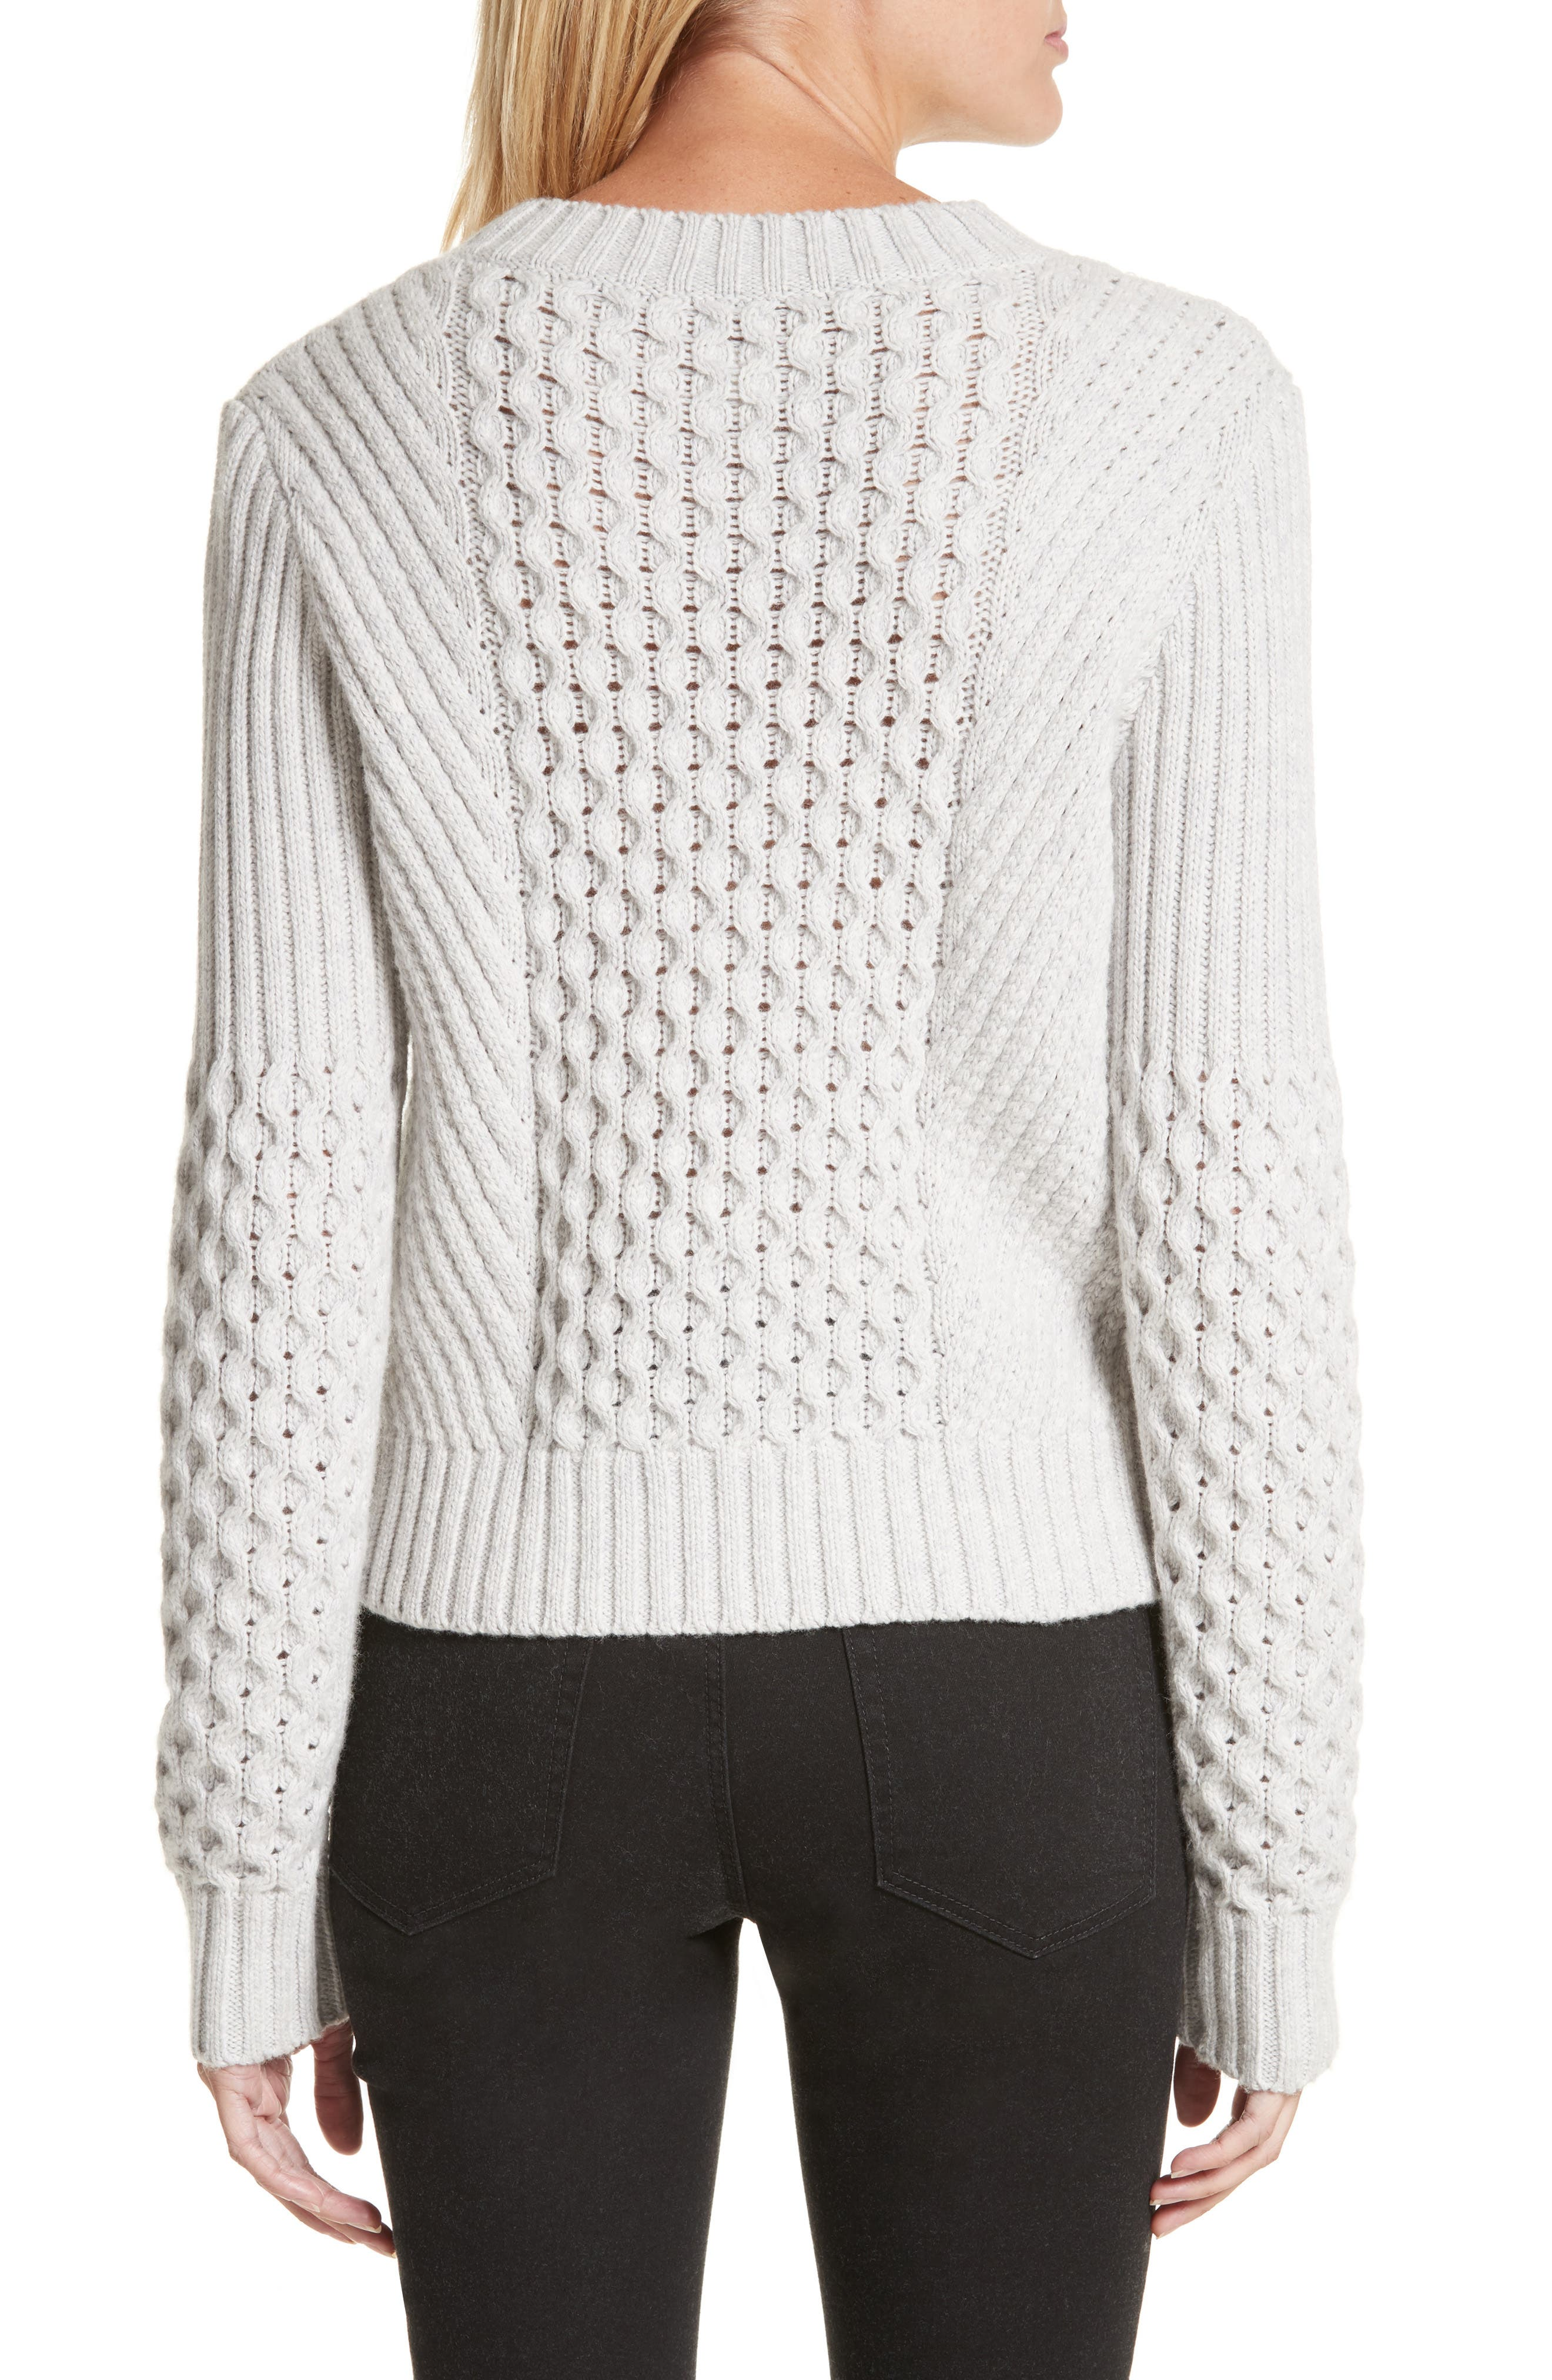 Honeycomb Stitch Sweater,                             Alternate thumbnail 2, color,                             Light Grey Heather